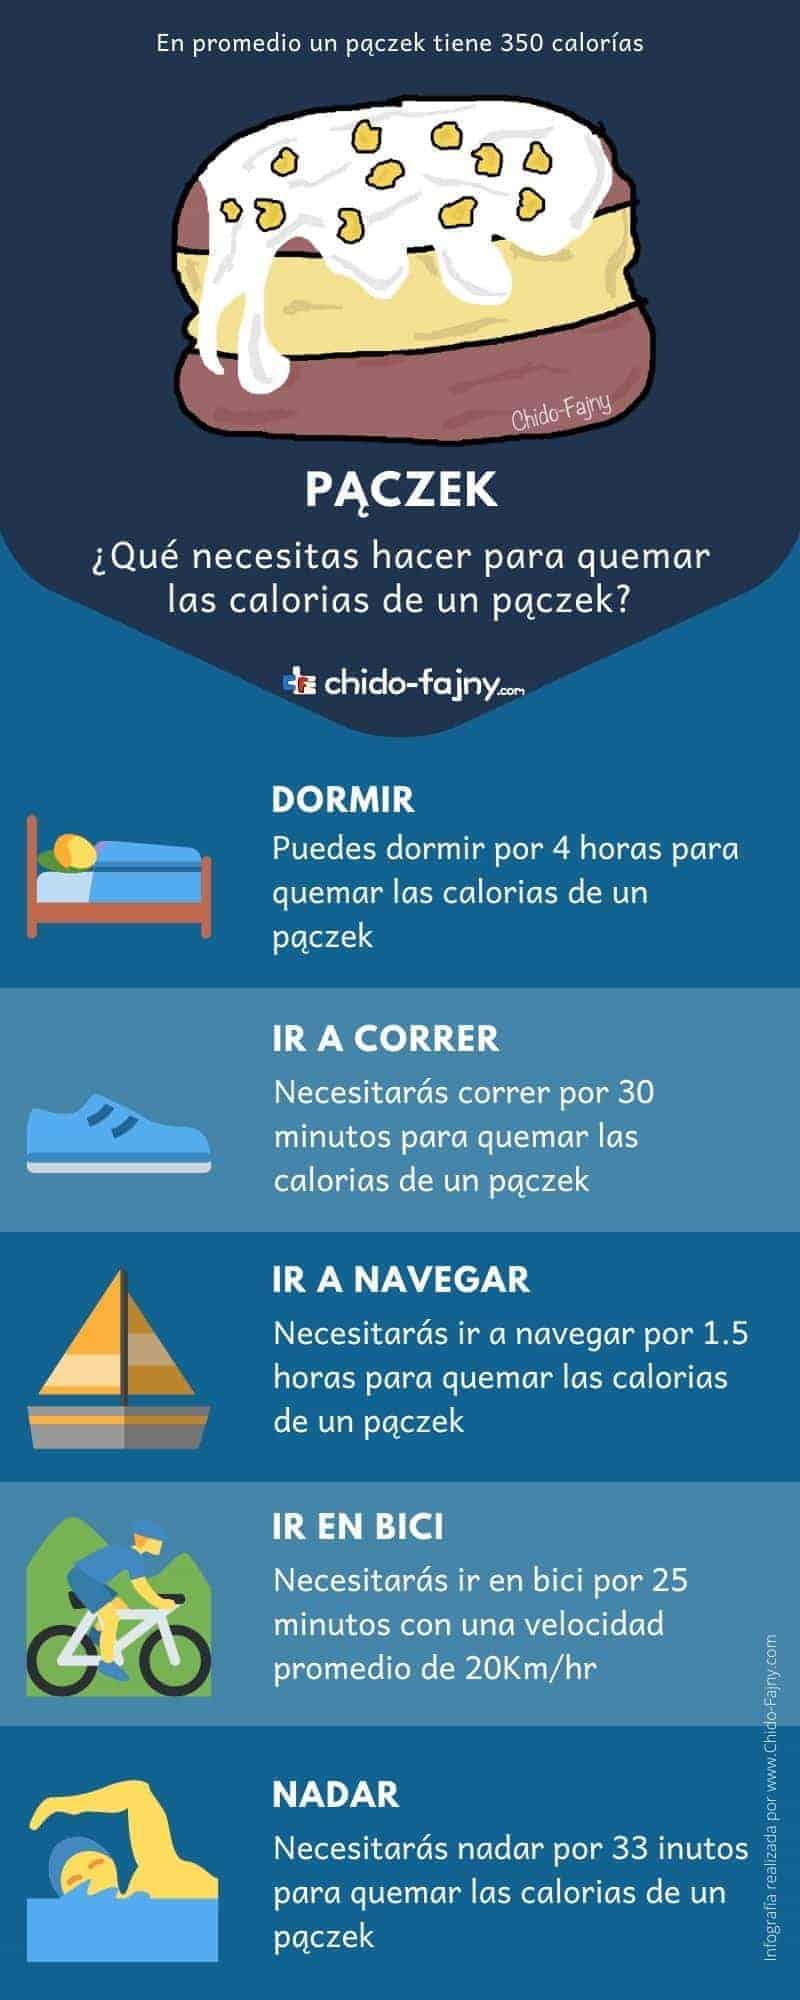 paczek-infographic-es-min